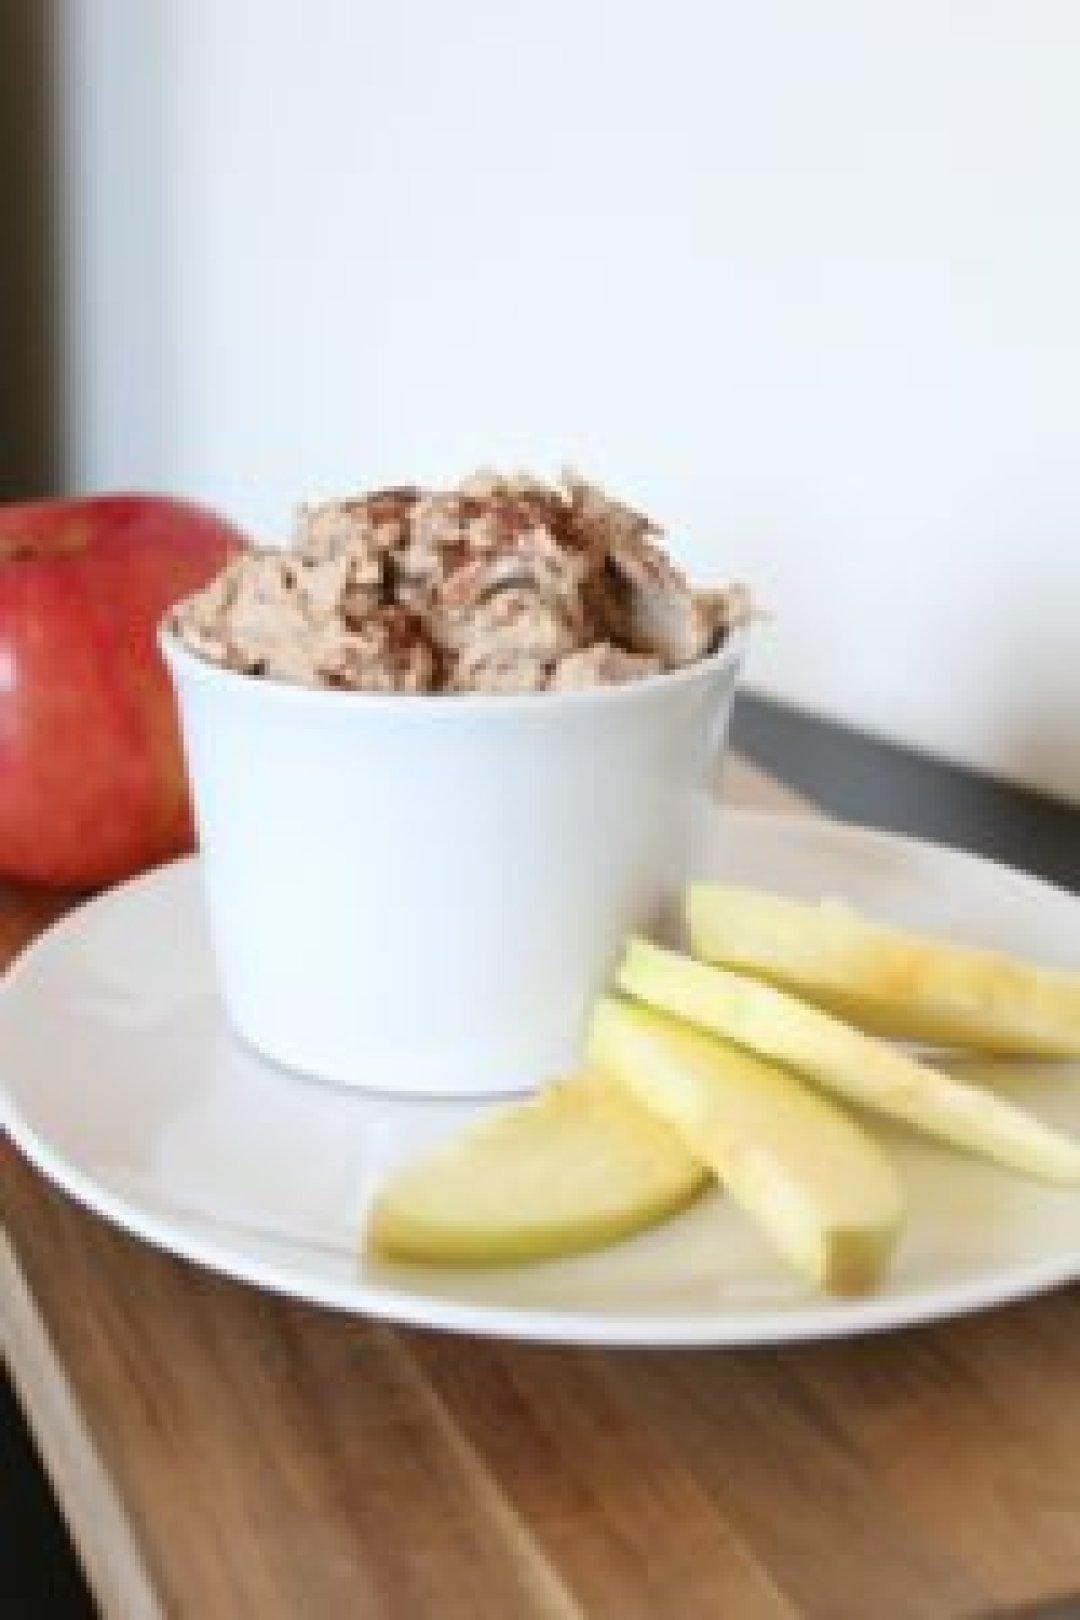 Peanut Butter Dip for Apples